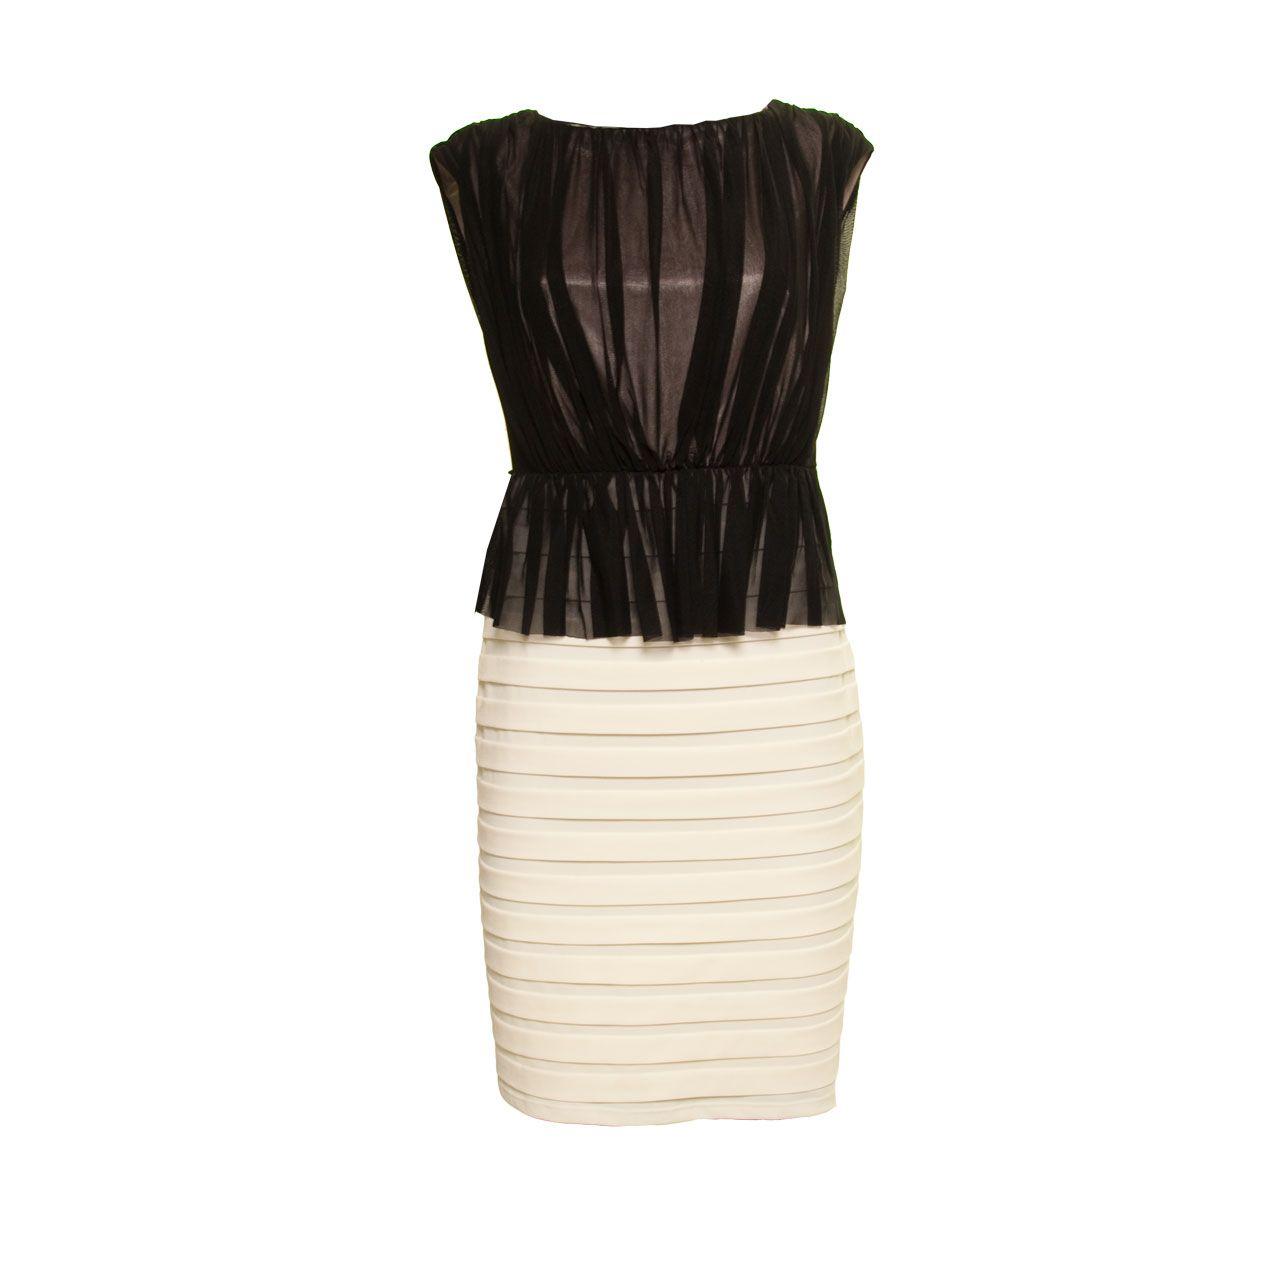 Jax Black Lace Cream End Dress   vestidos hermosos   Pinterest ...